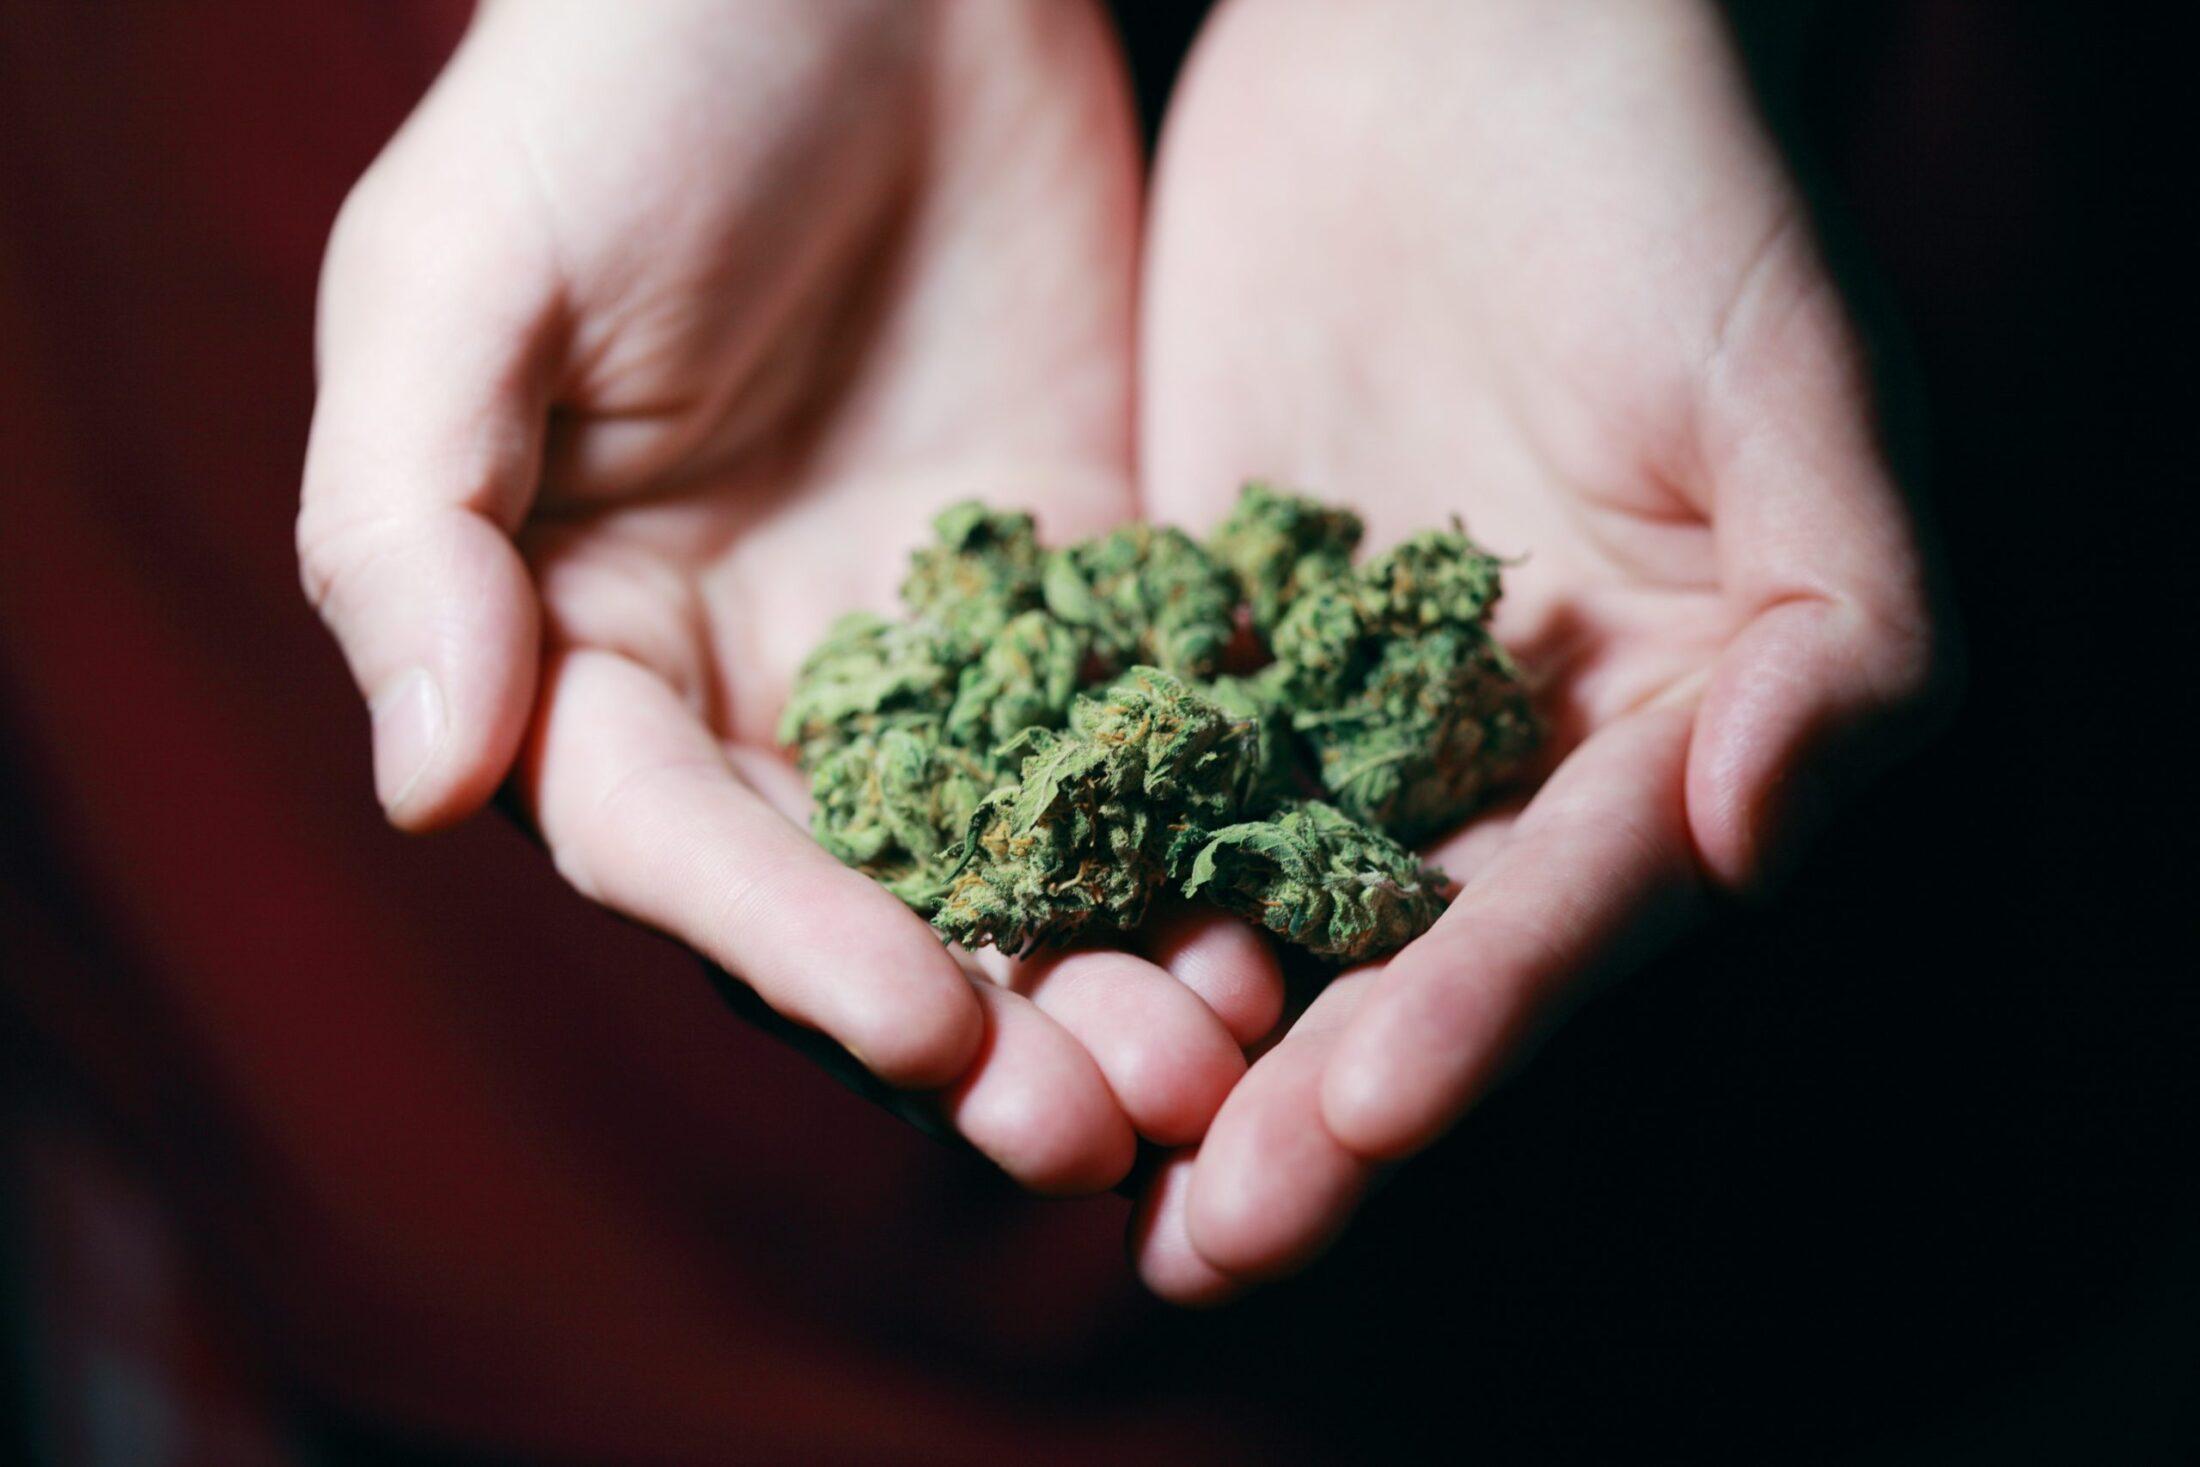 Medical Cannabis Pennsylvania